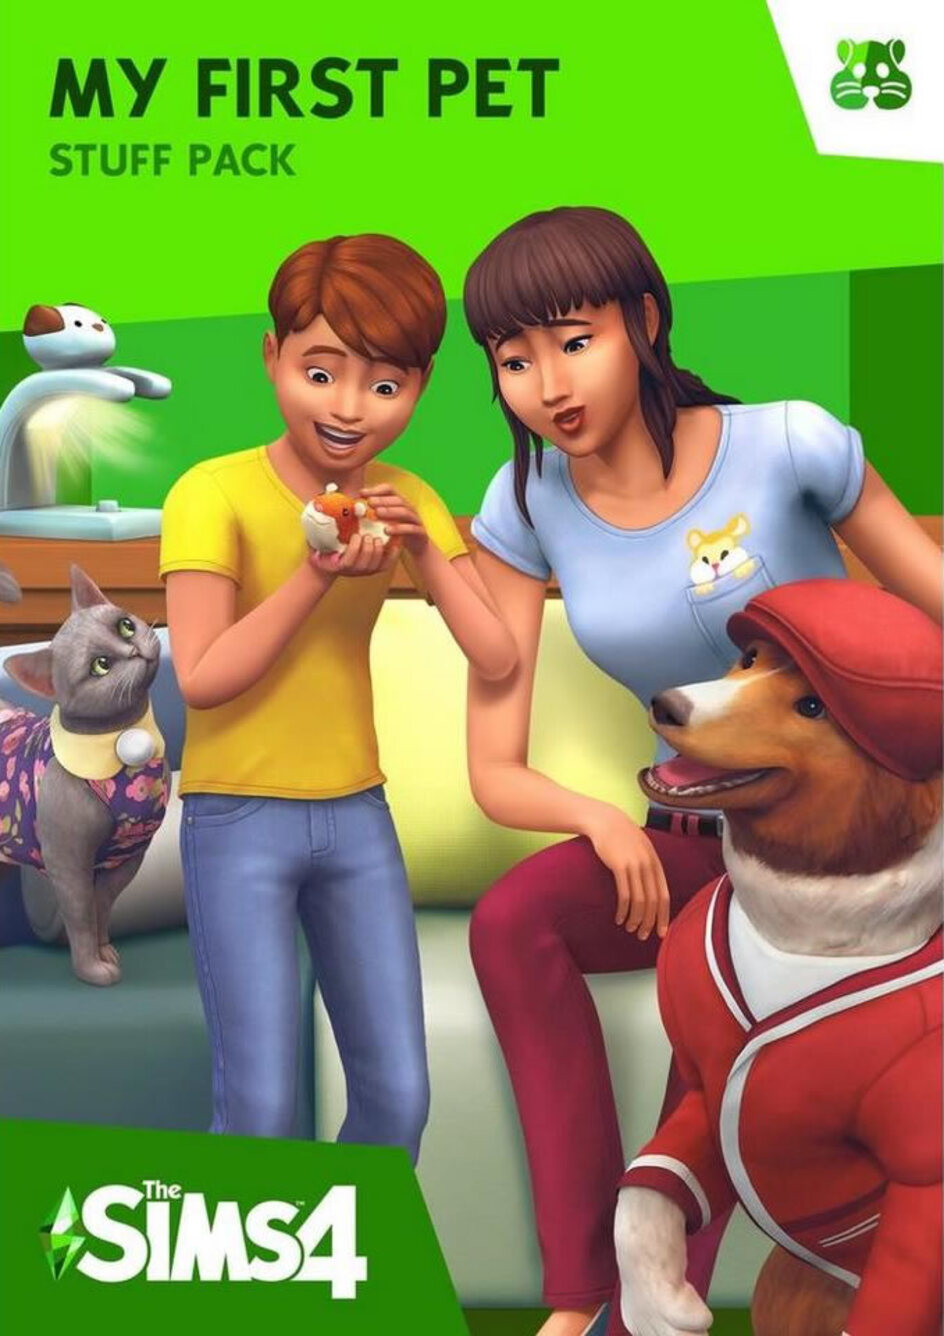 The Sims 4 My First Pet Stuff - Origin